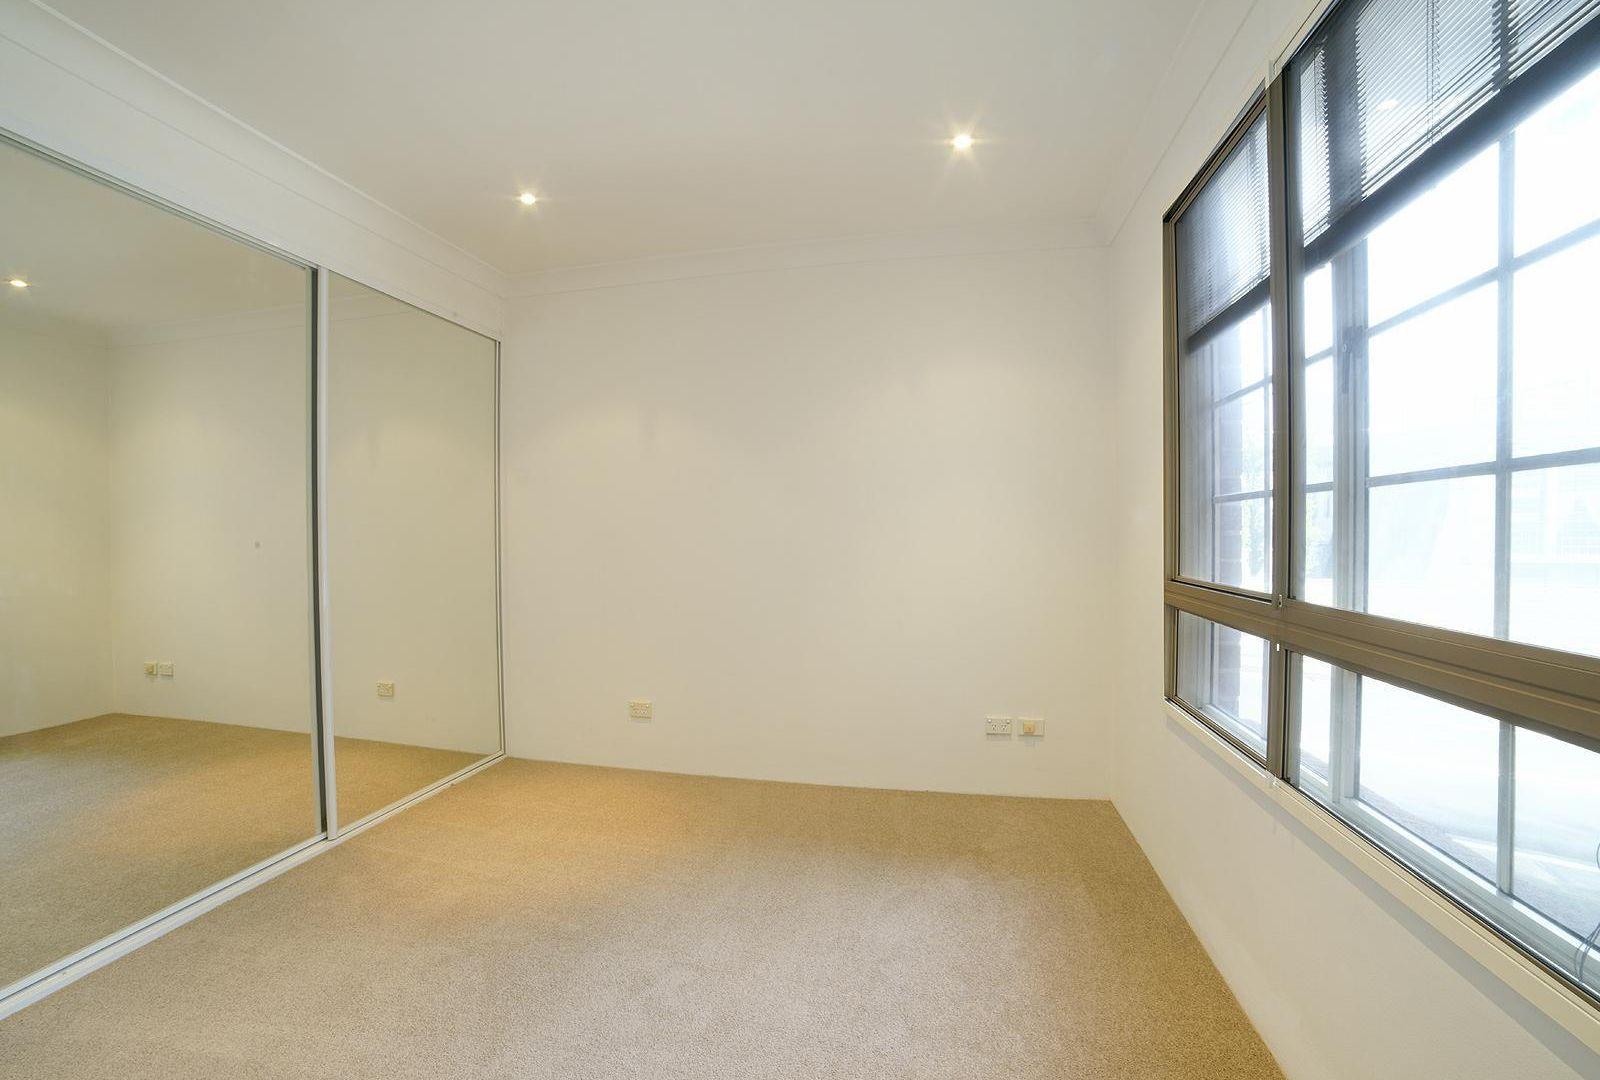 16/1 McDougall Street, Kirribilli NSW 2061, Image 1